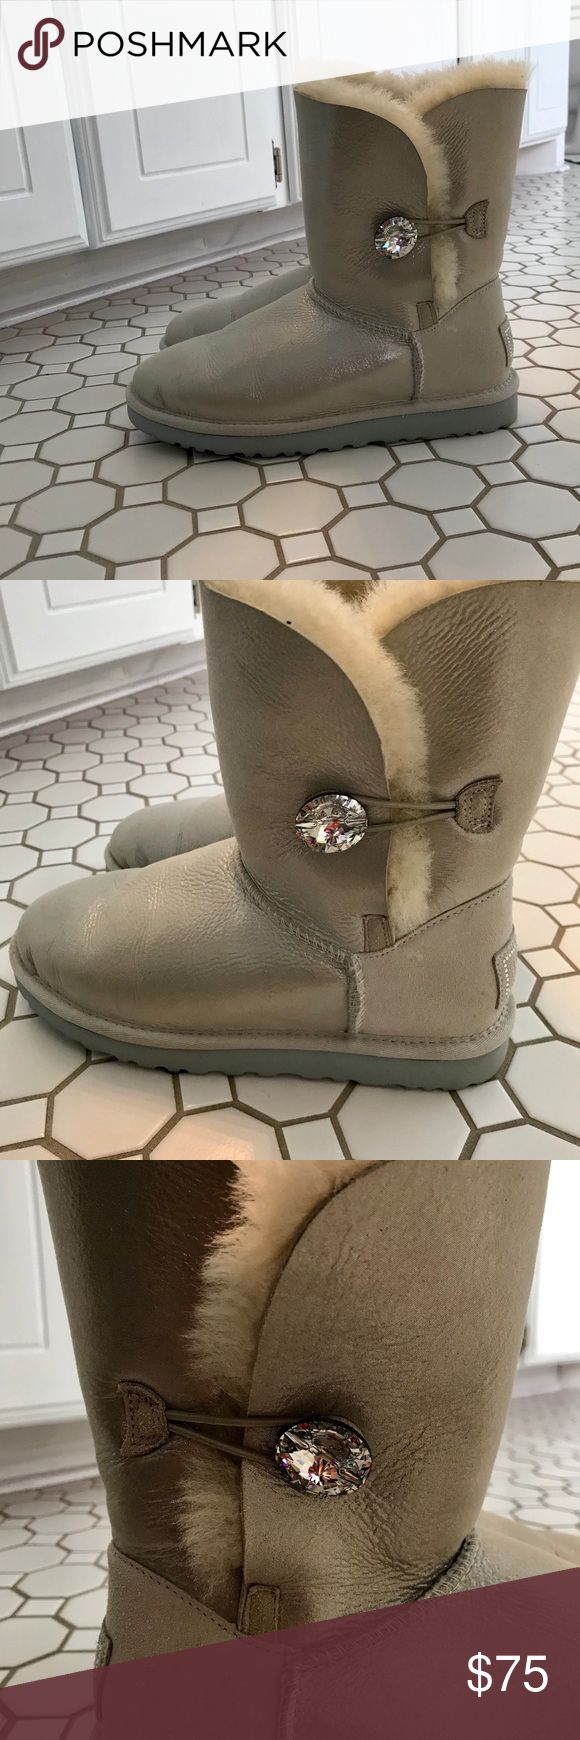 Spotted while shopping on Poshmark: UGG Classic Short boots! #poshmark #fashion #shopping #style #UGG #Shoes